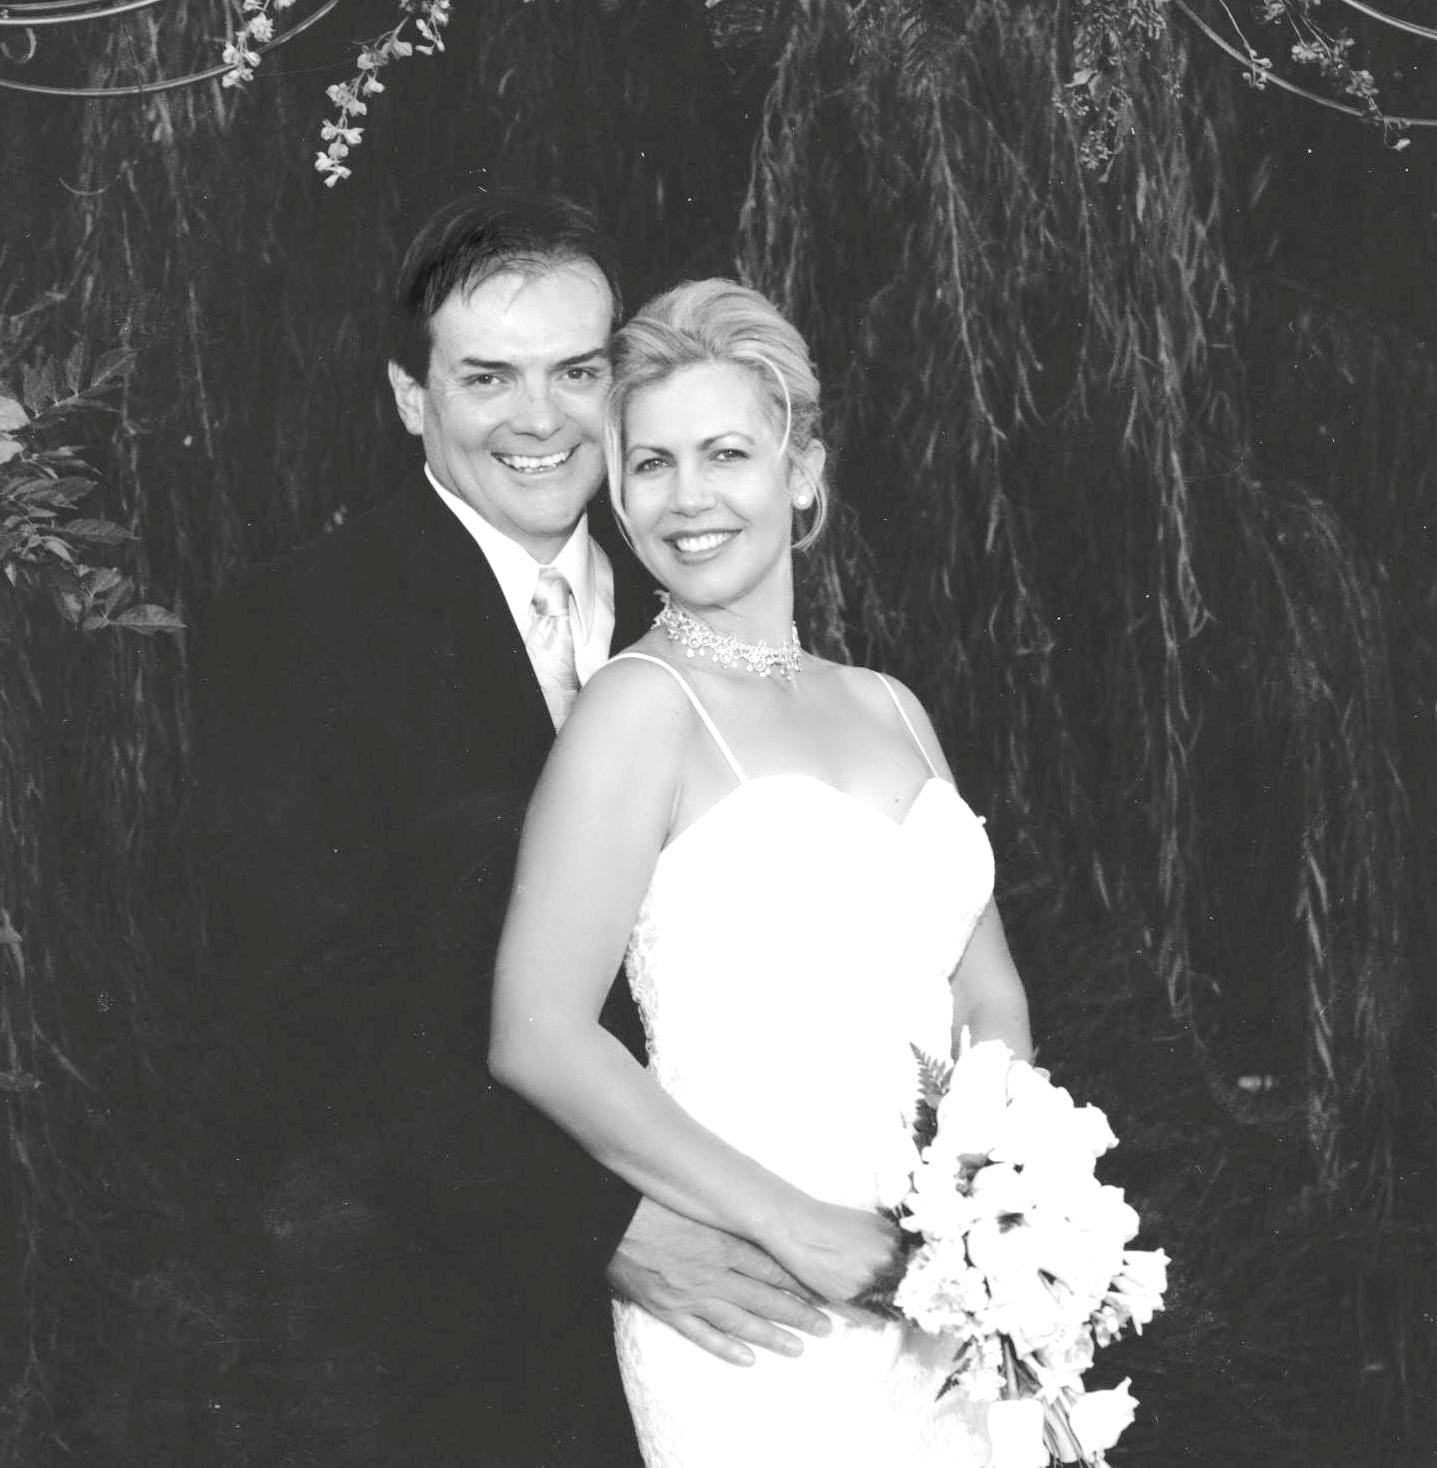 Scott and Heather Wedding shot b and w.jpg